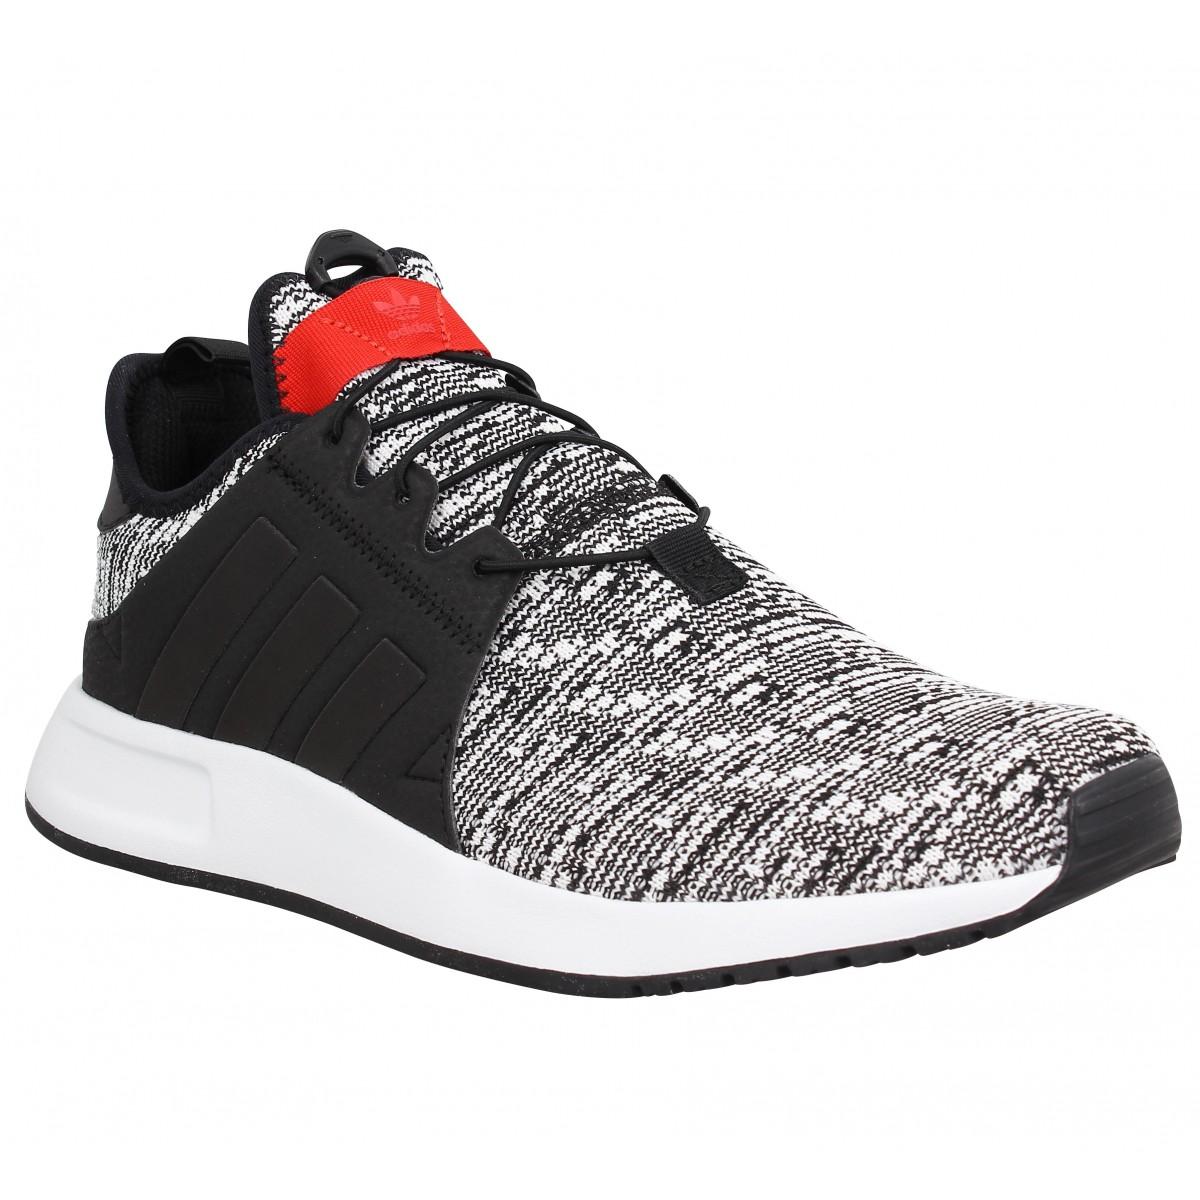 Adidas Marque X Plr Toile Homme-44-black